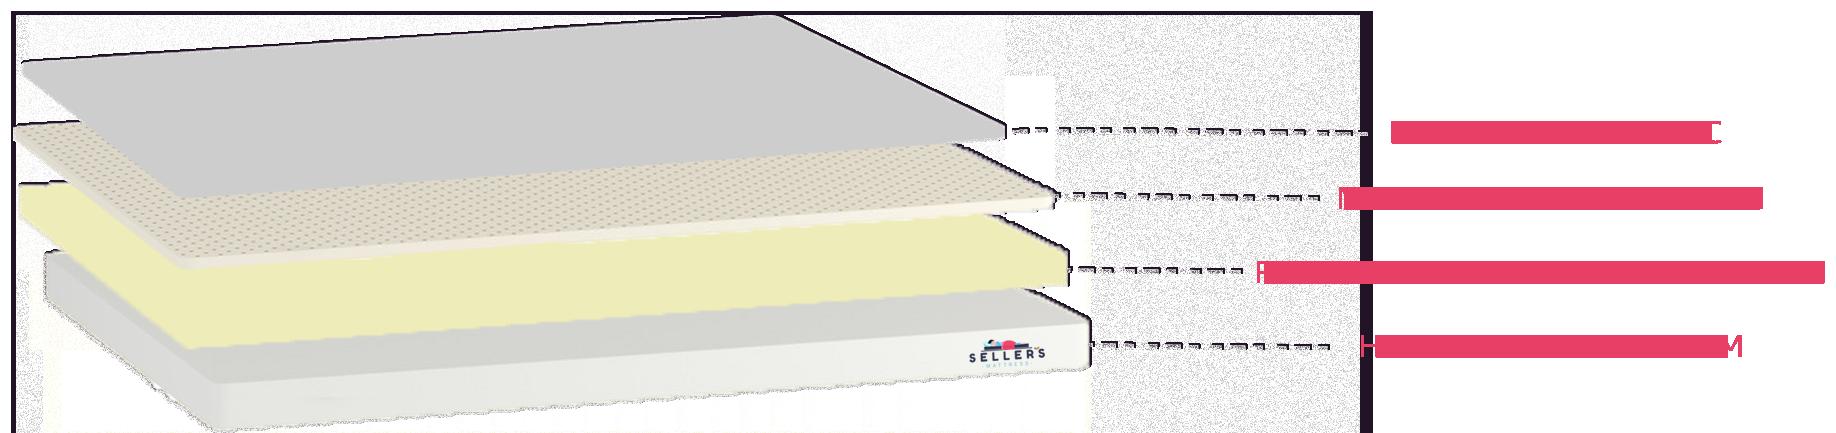 Ortho Layers